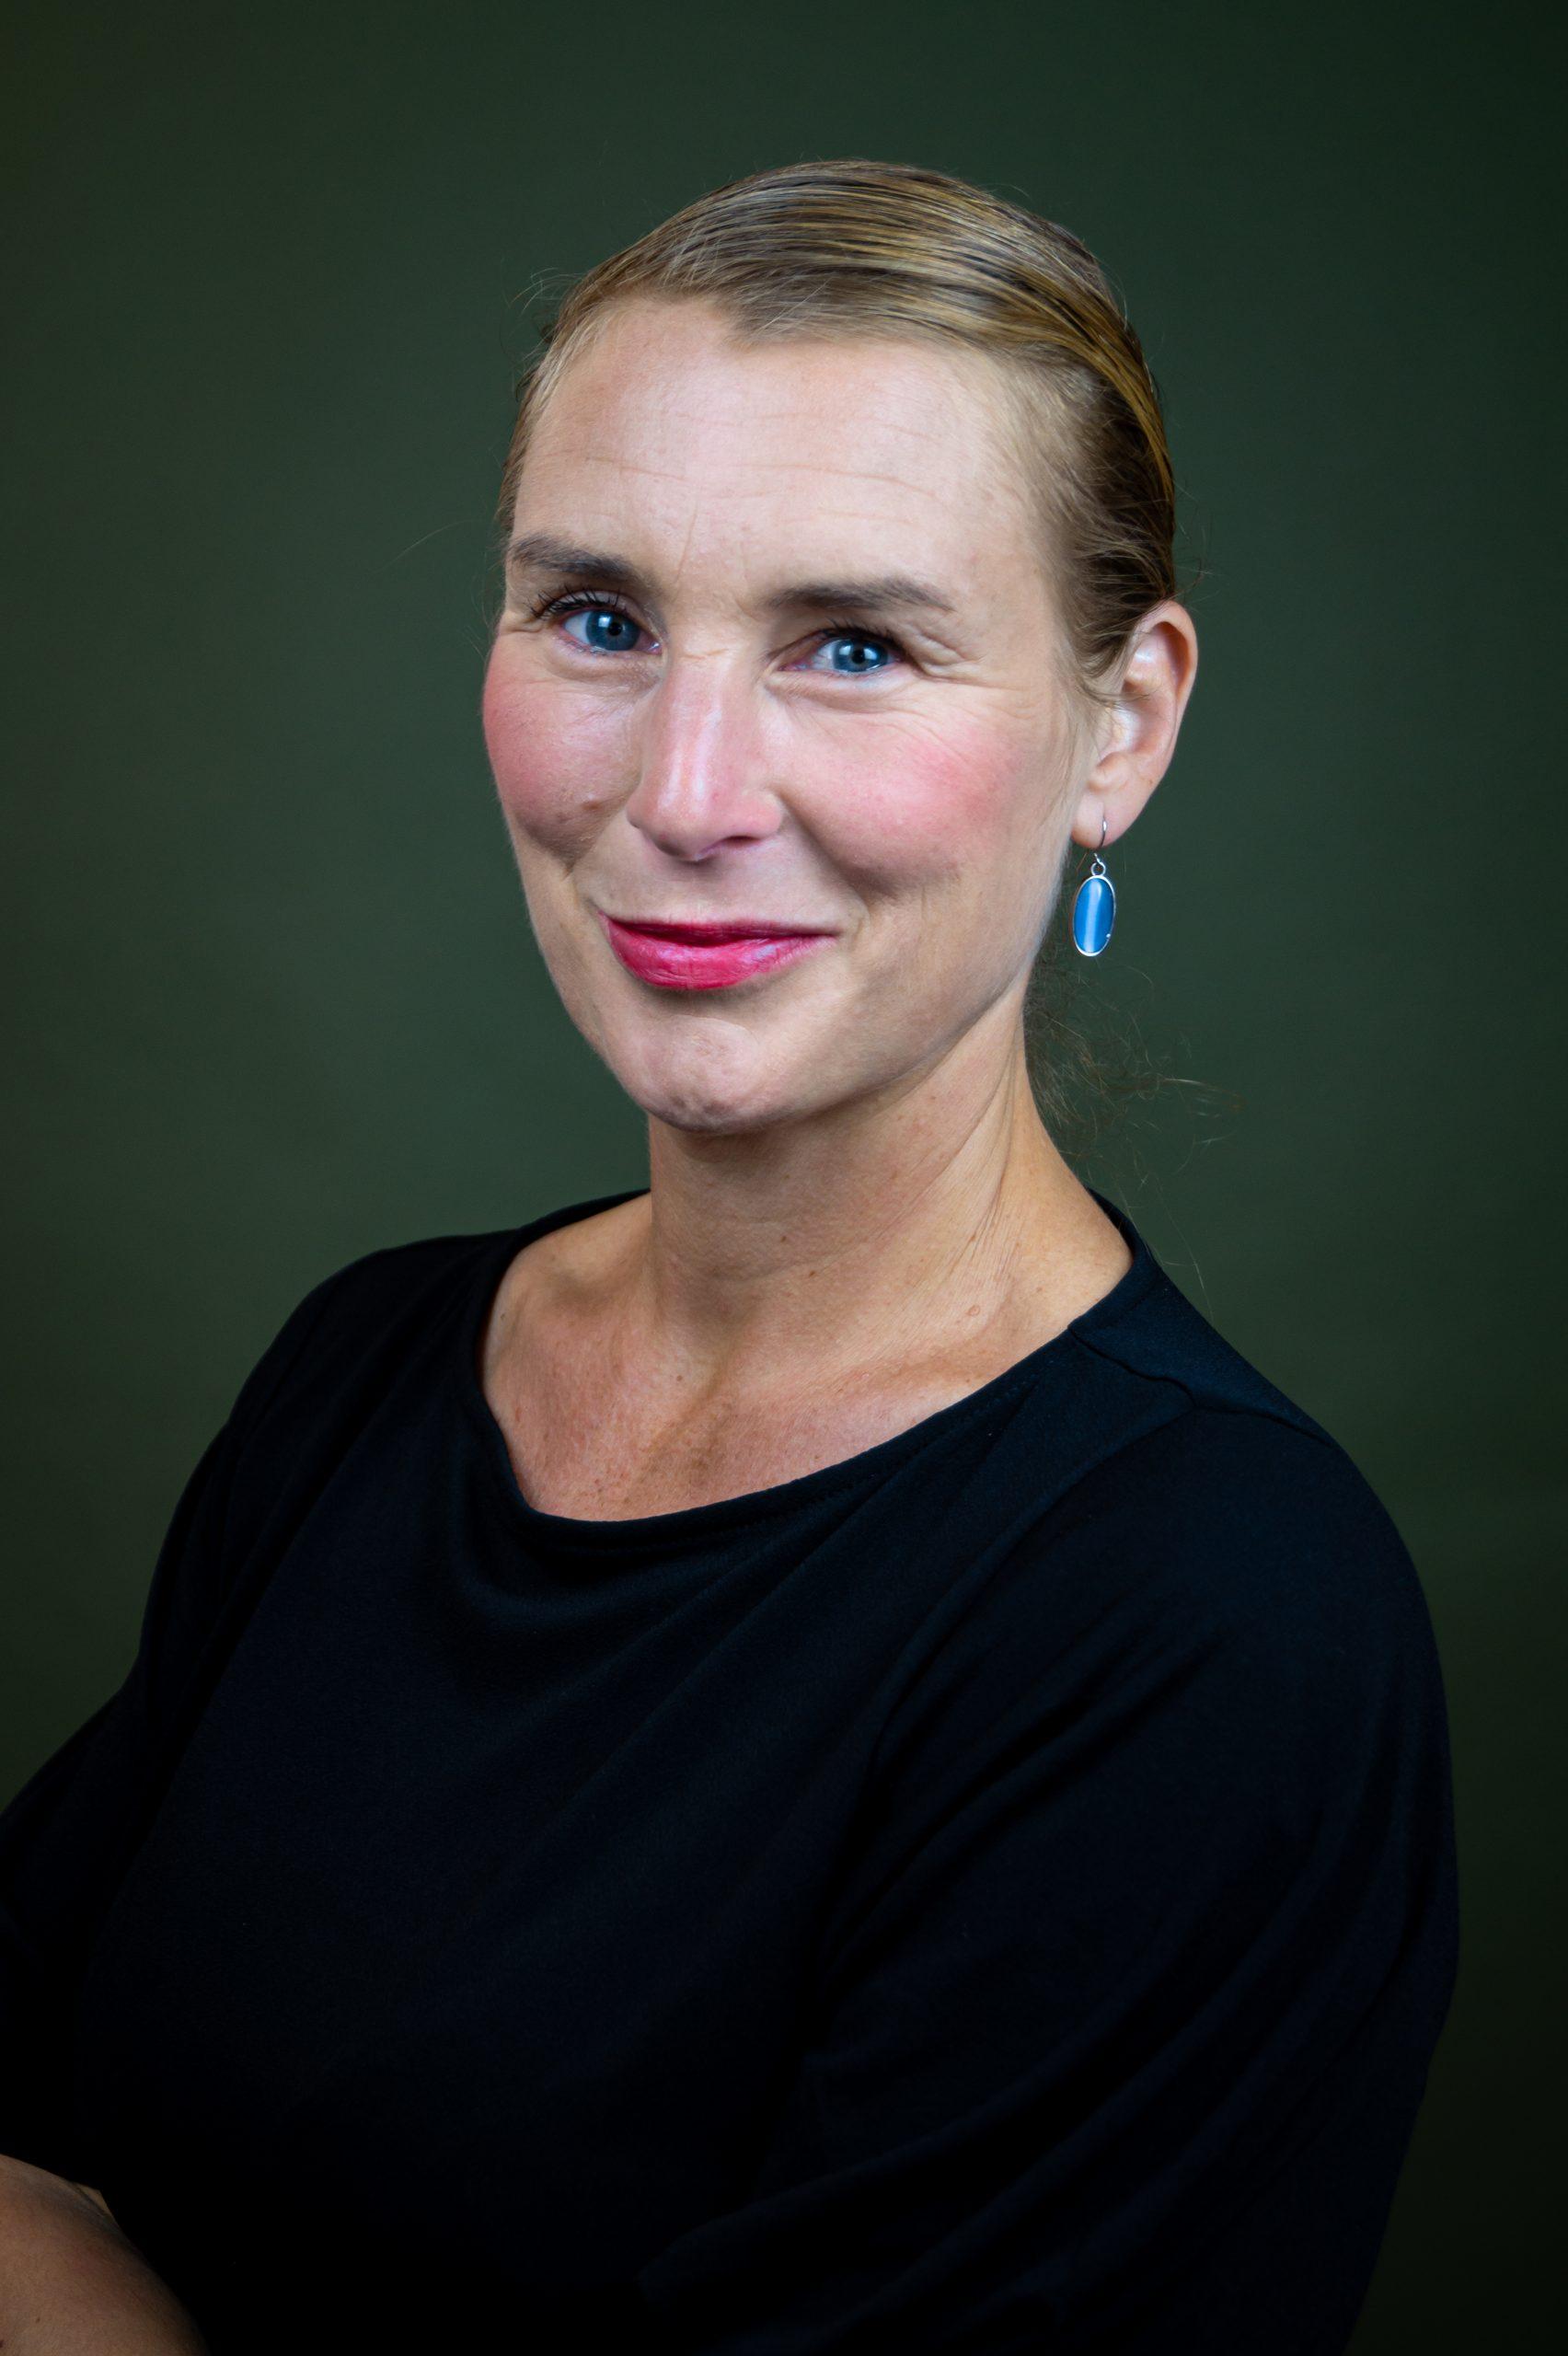 Natasja van den Berg